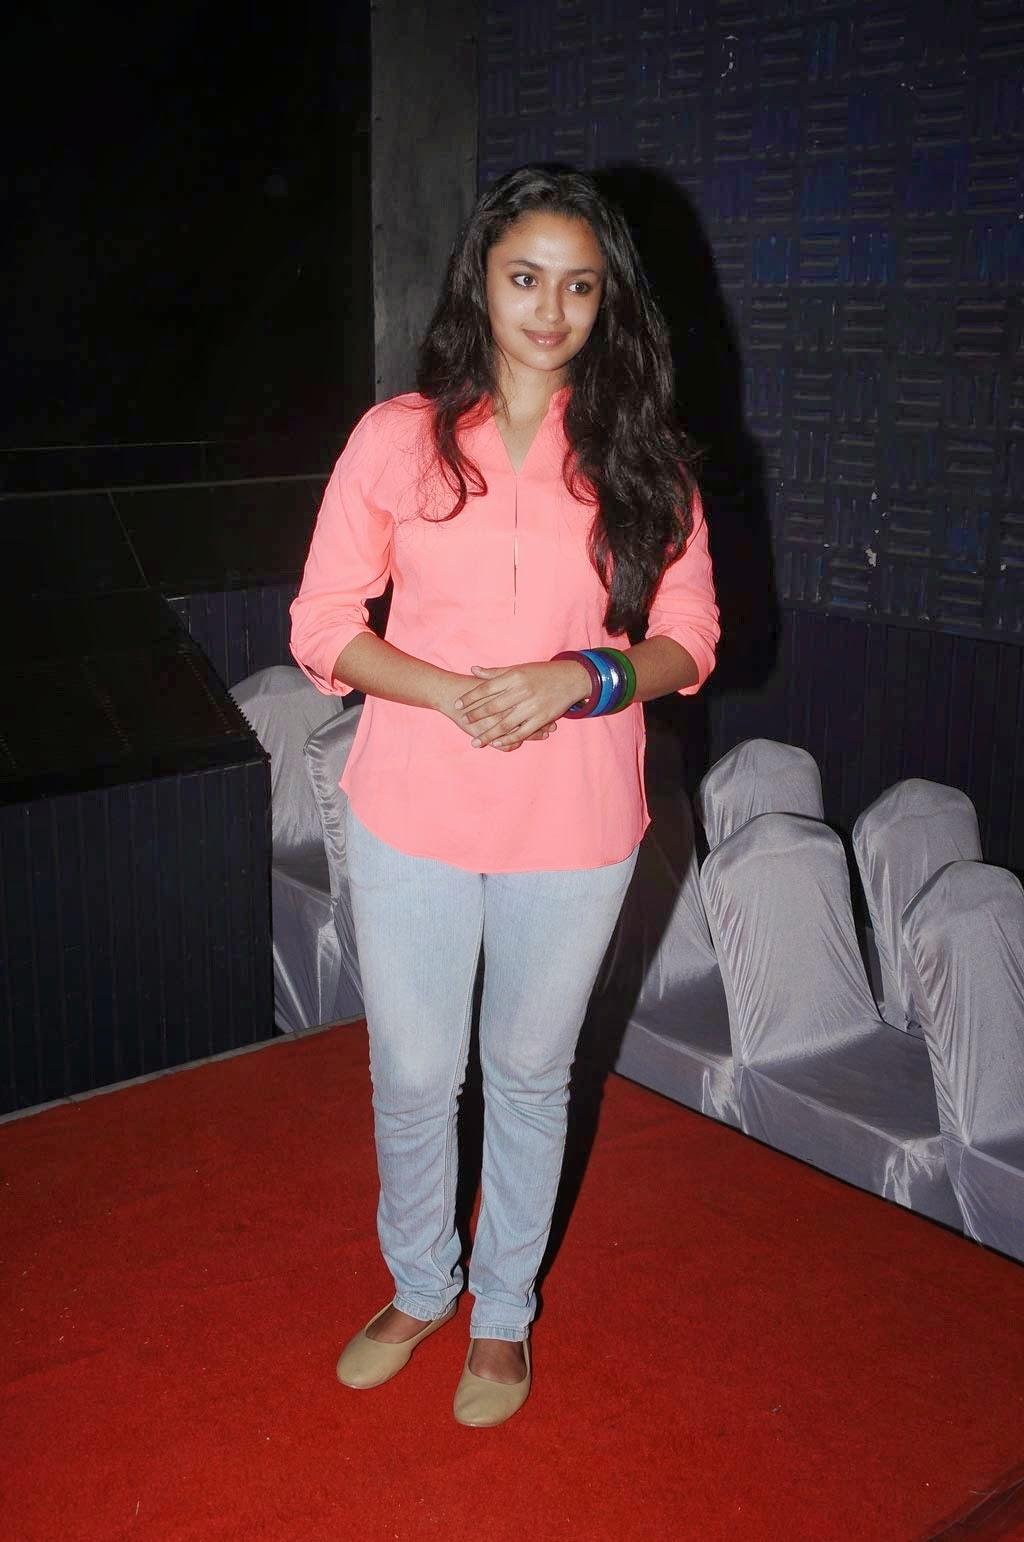 Malayalam Actress Malavika Nair Hot Photos In Pink Shirt Blue Jeans